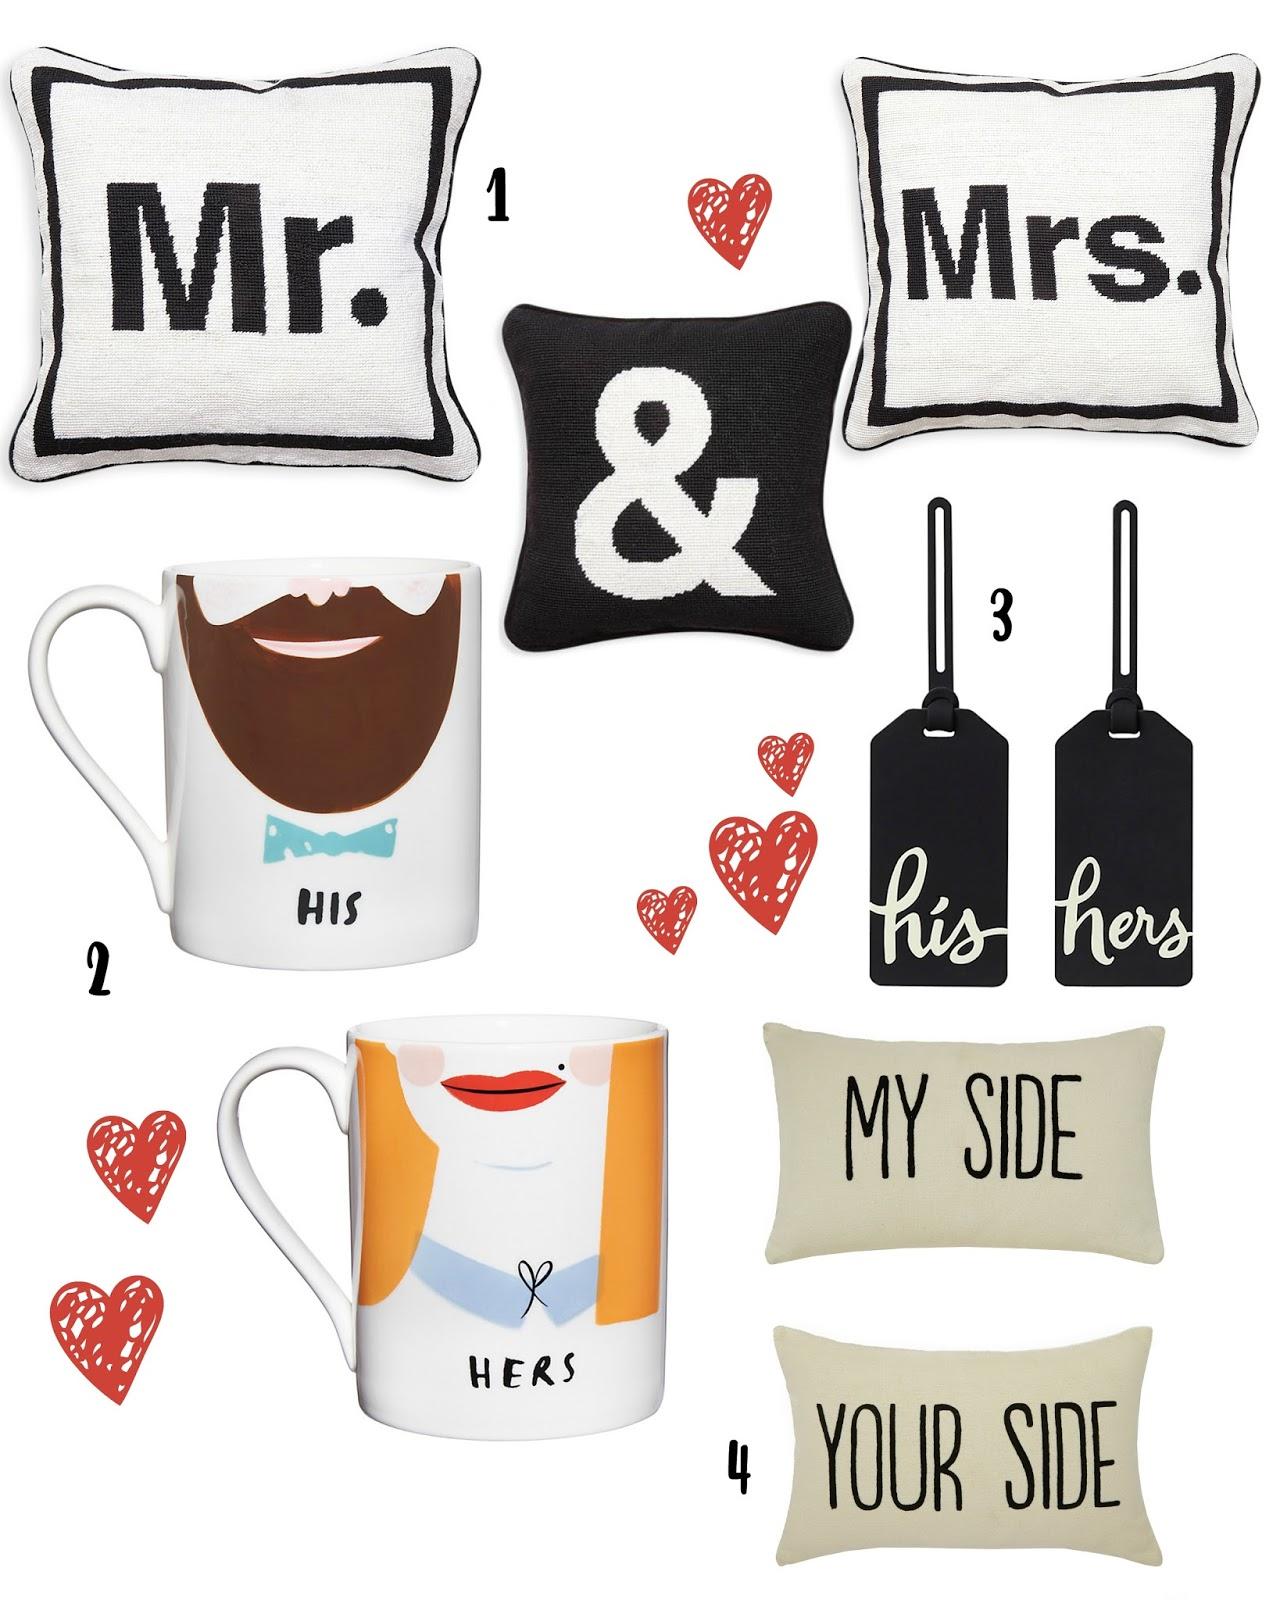 Modern Wedding Gifts: 14 Last-minute Modern Wedding Gift Ideas For Mr. & Mrs